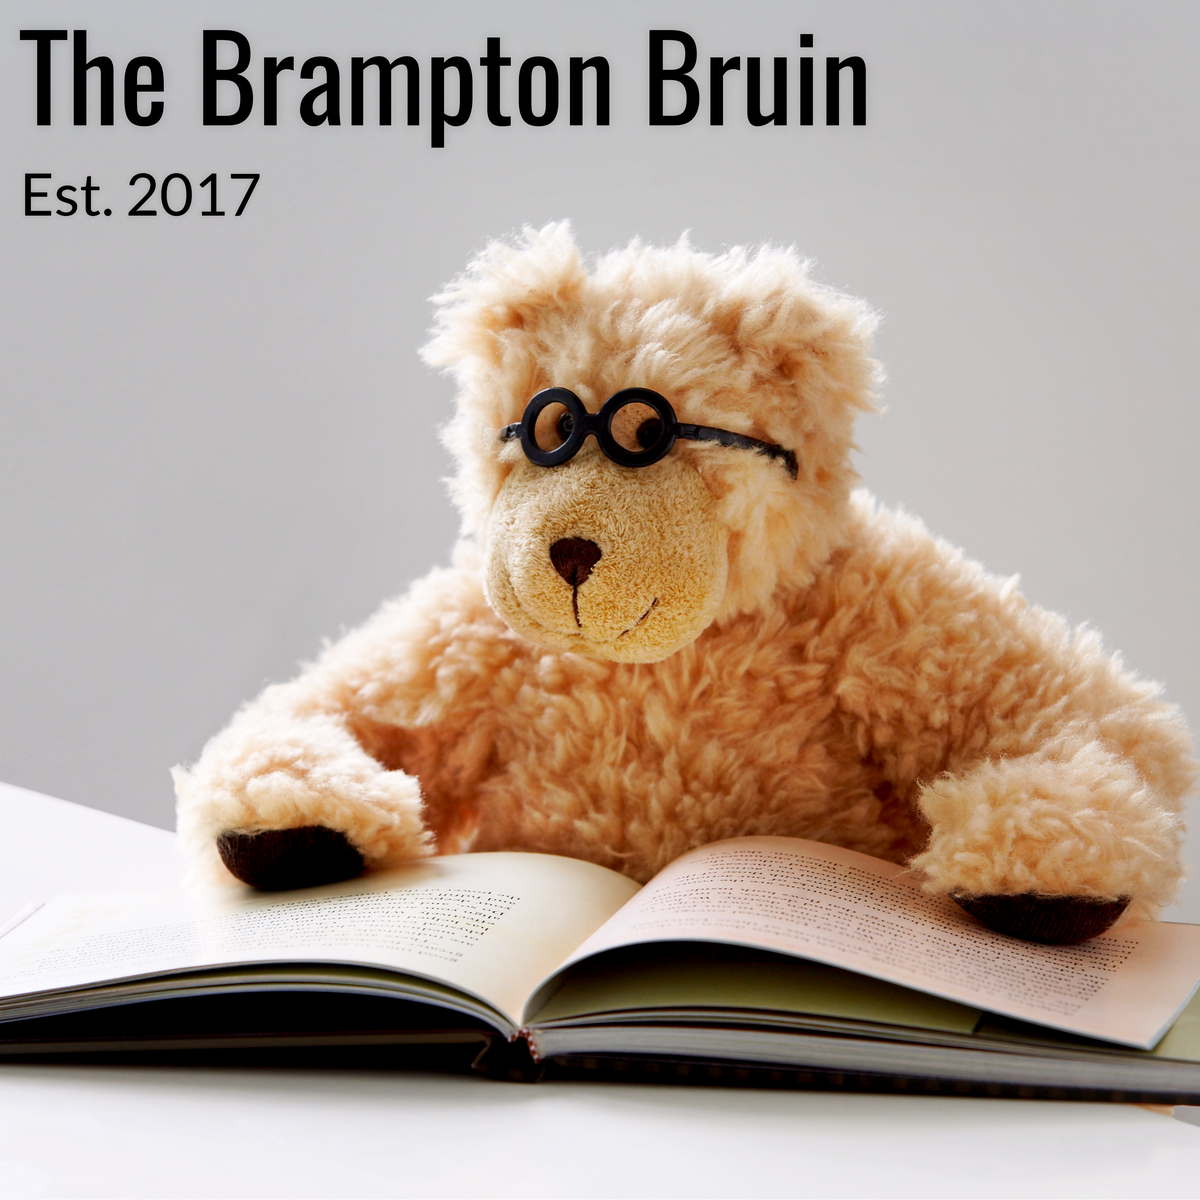 The Brampton Bruin